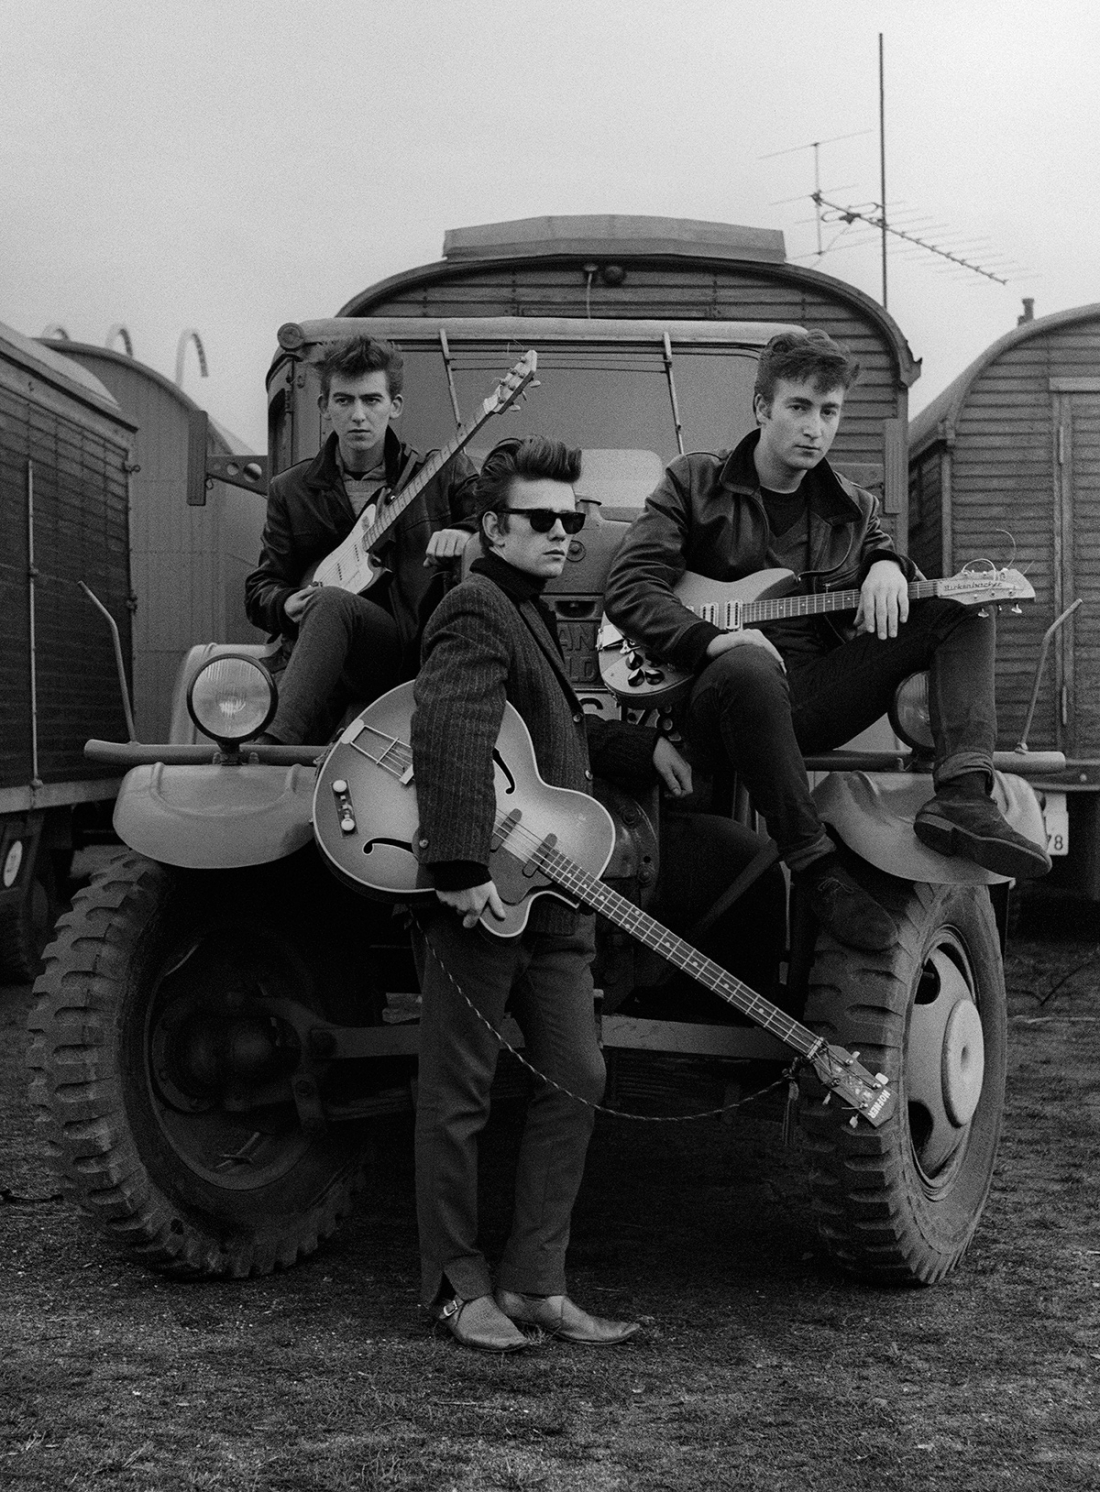 Astrid Kirchherr, John Lennon, Stuart Sutcliffe y George Harrison en un camión en el recinto ferial, 1960